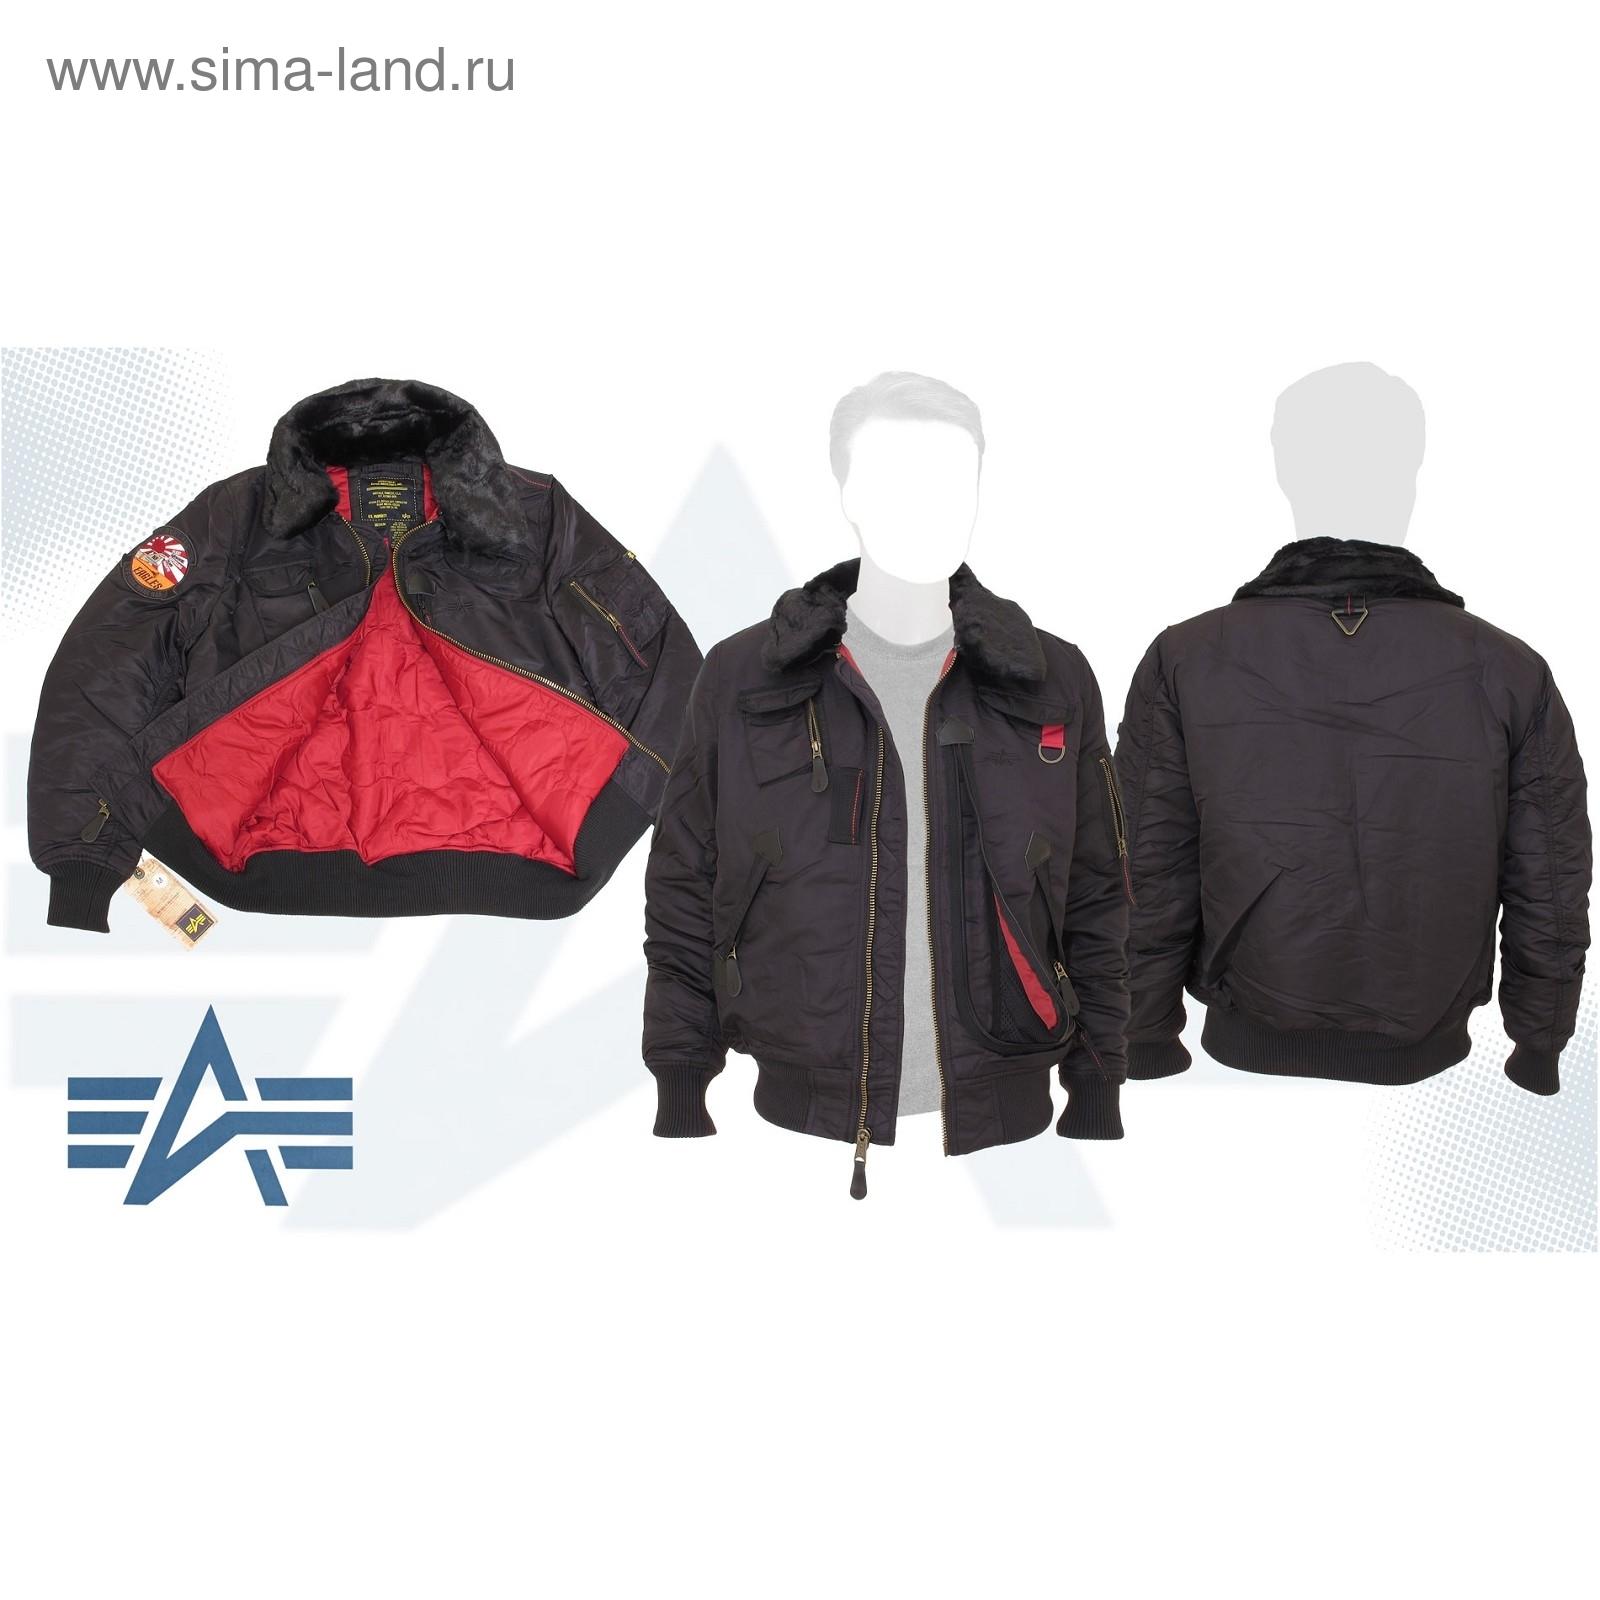 Куртка утеплённая Injector X Alpha Industries Washed Black f8de8b536f379